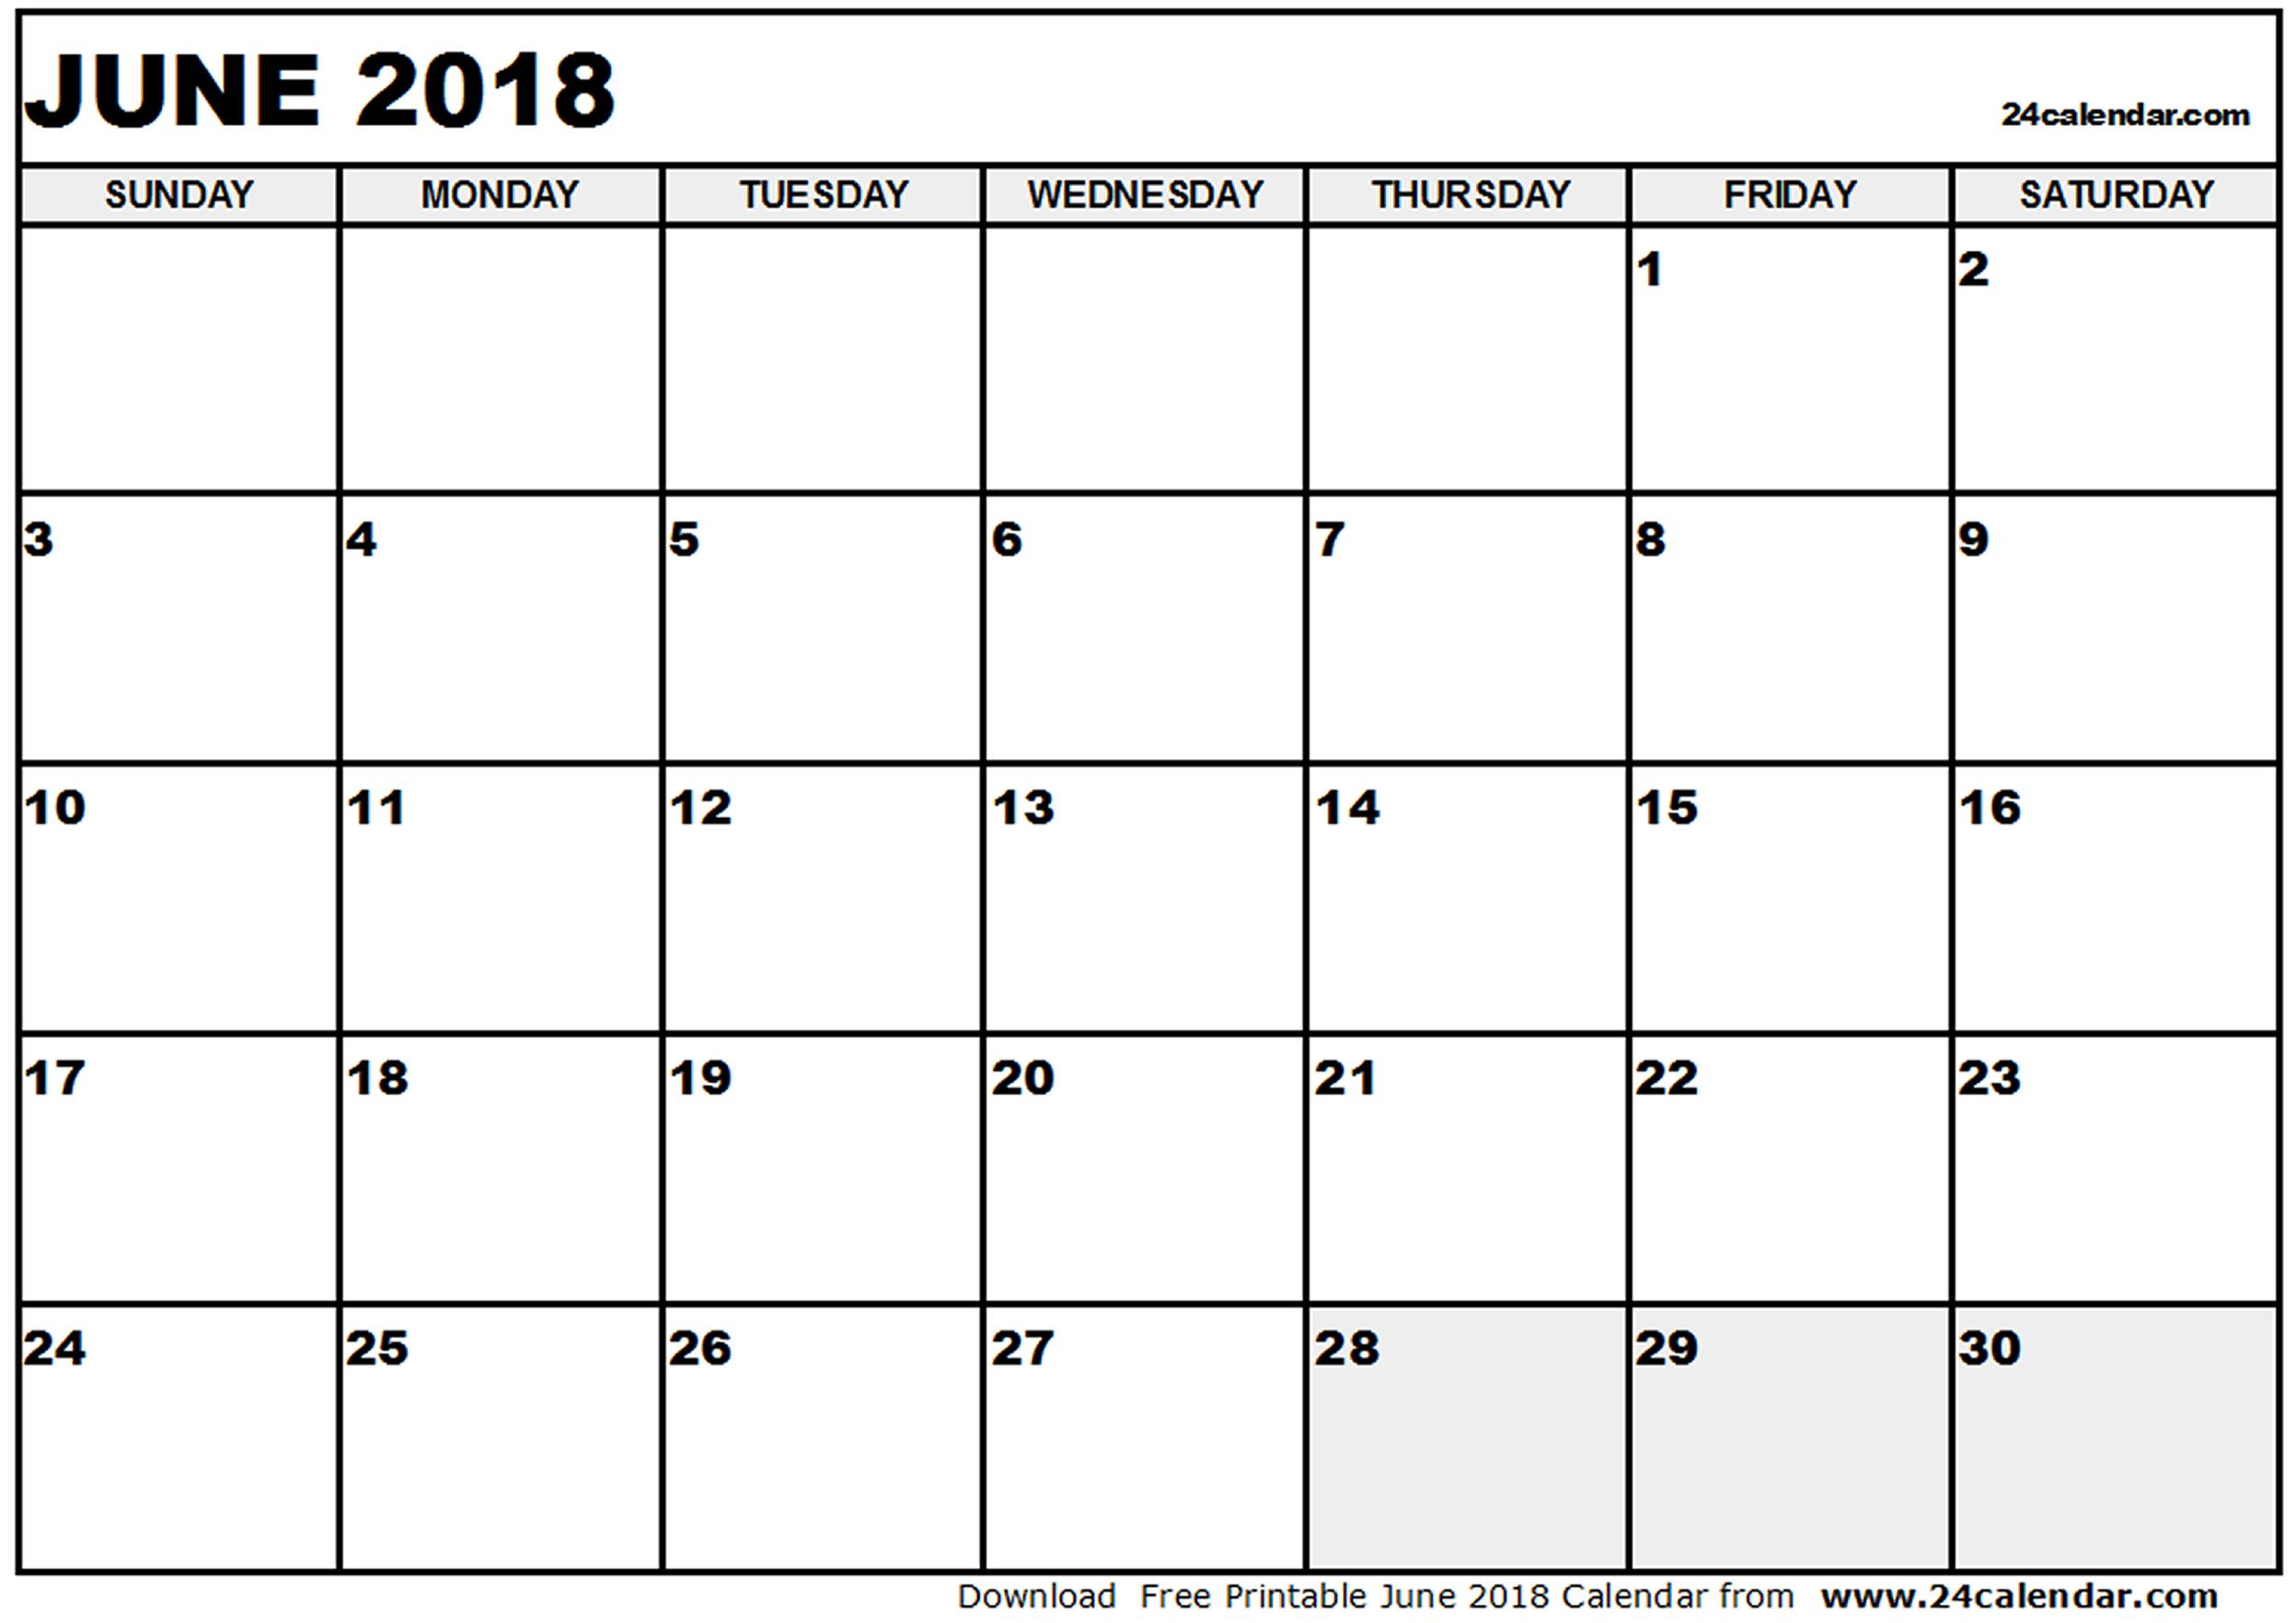 June 2018 Calendar PDF | calendar printable free